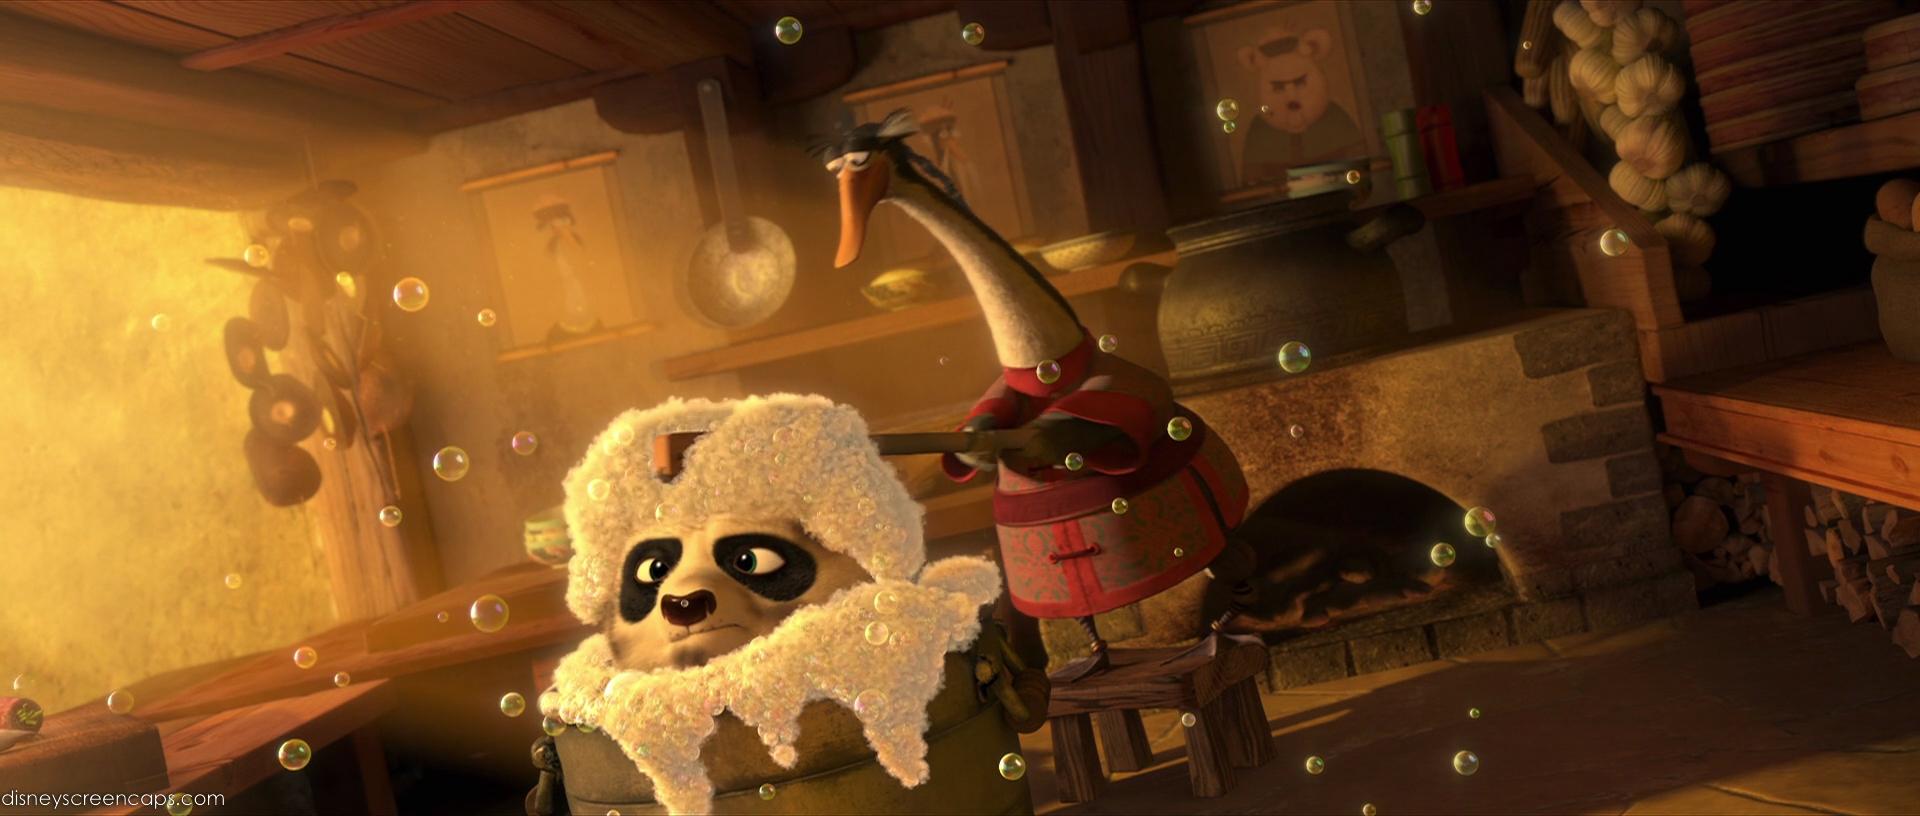 Group Of Baby Po Kung Fu Panda 2 Wallpaper